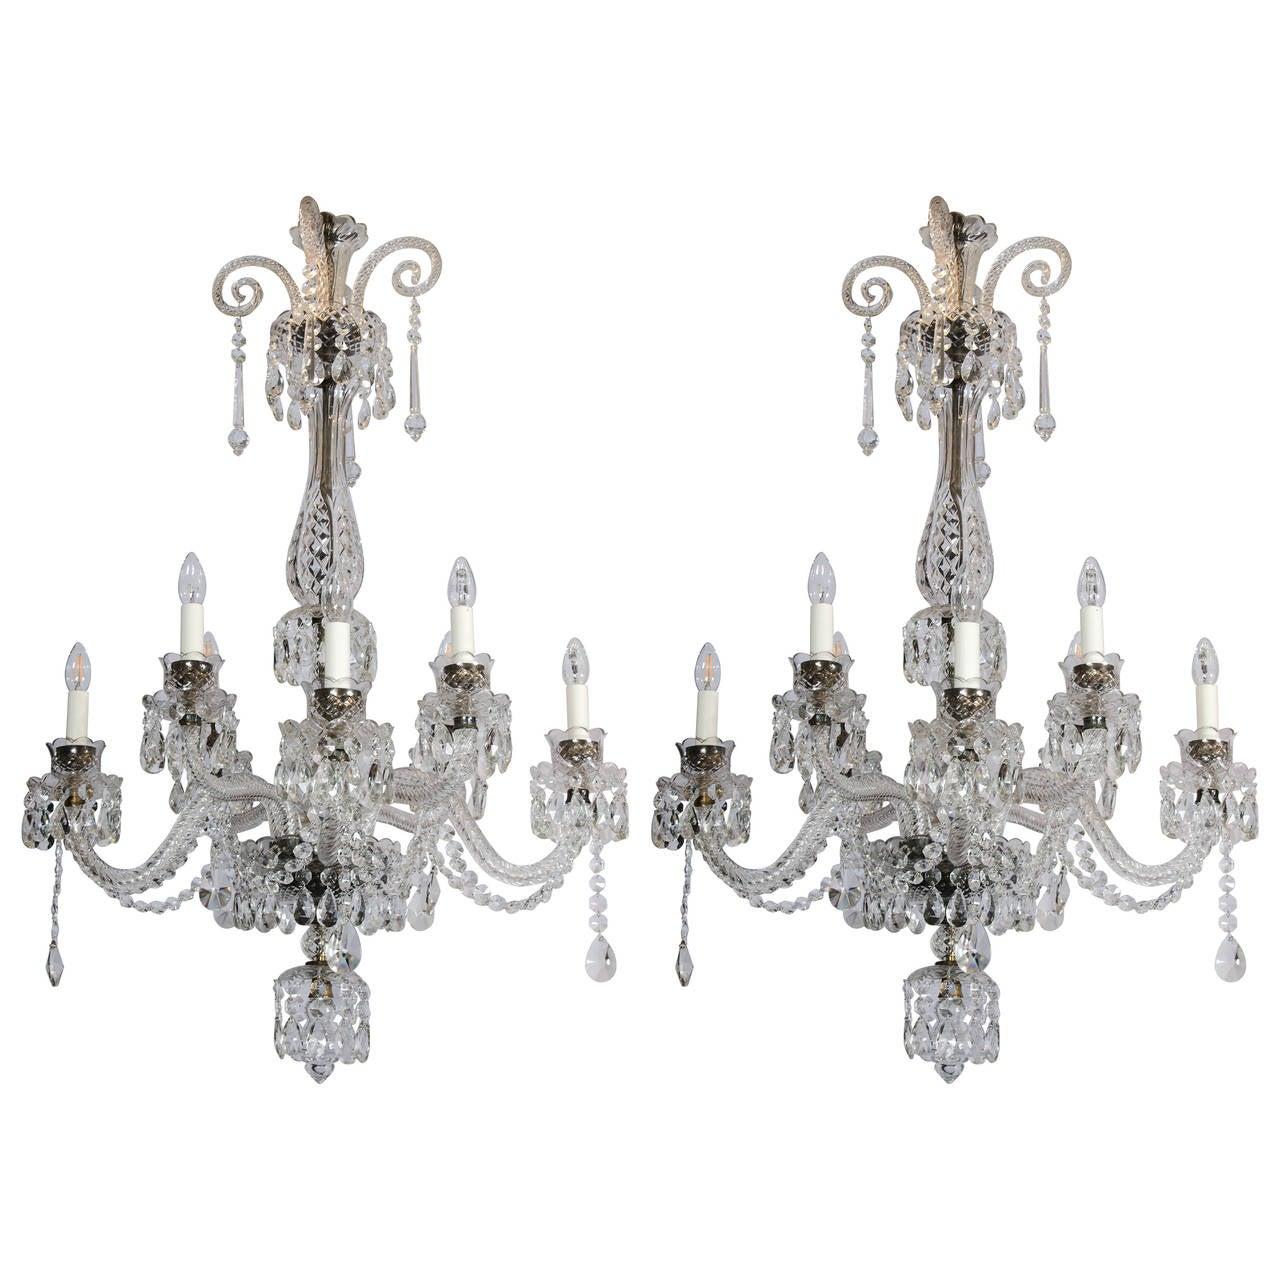 Pair of English Georgian Style Crystal Chandeliers